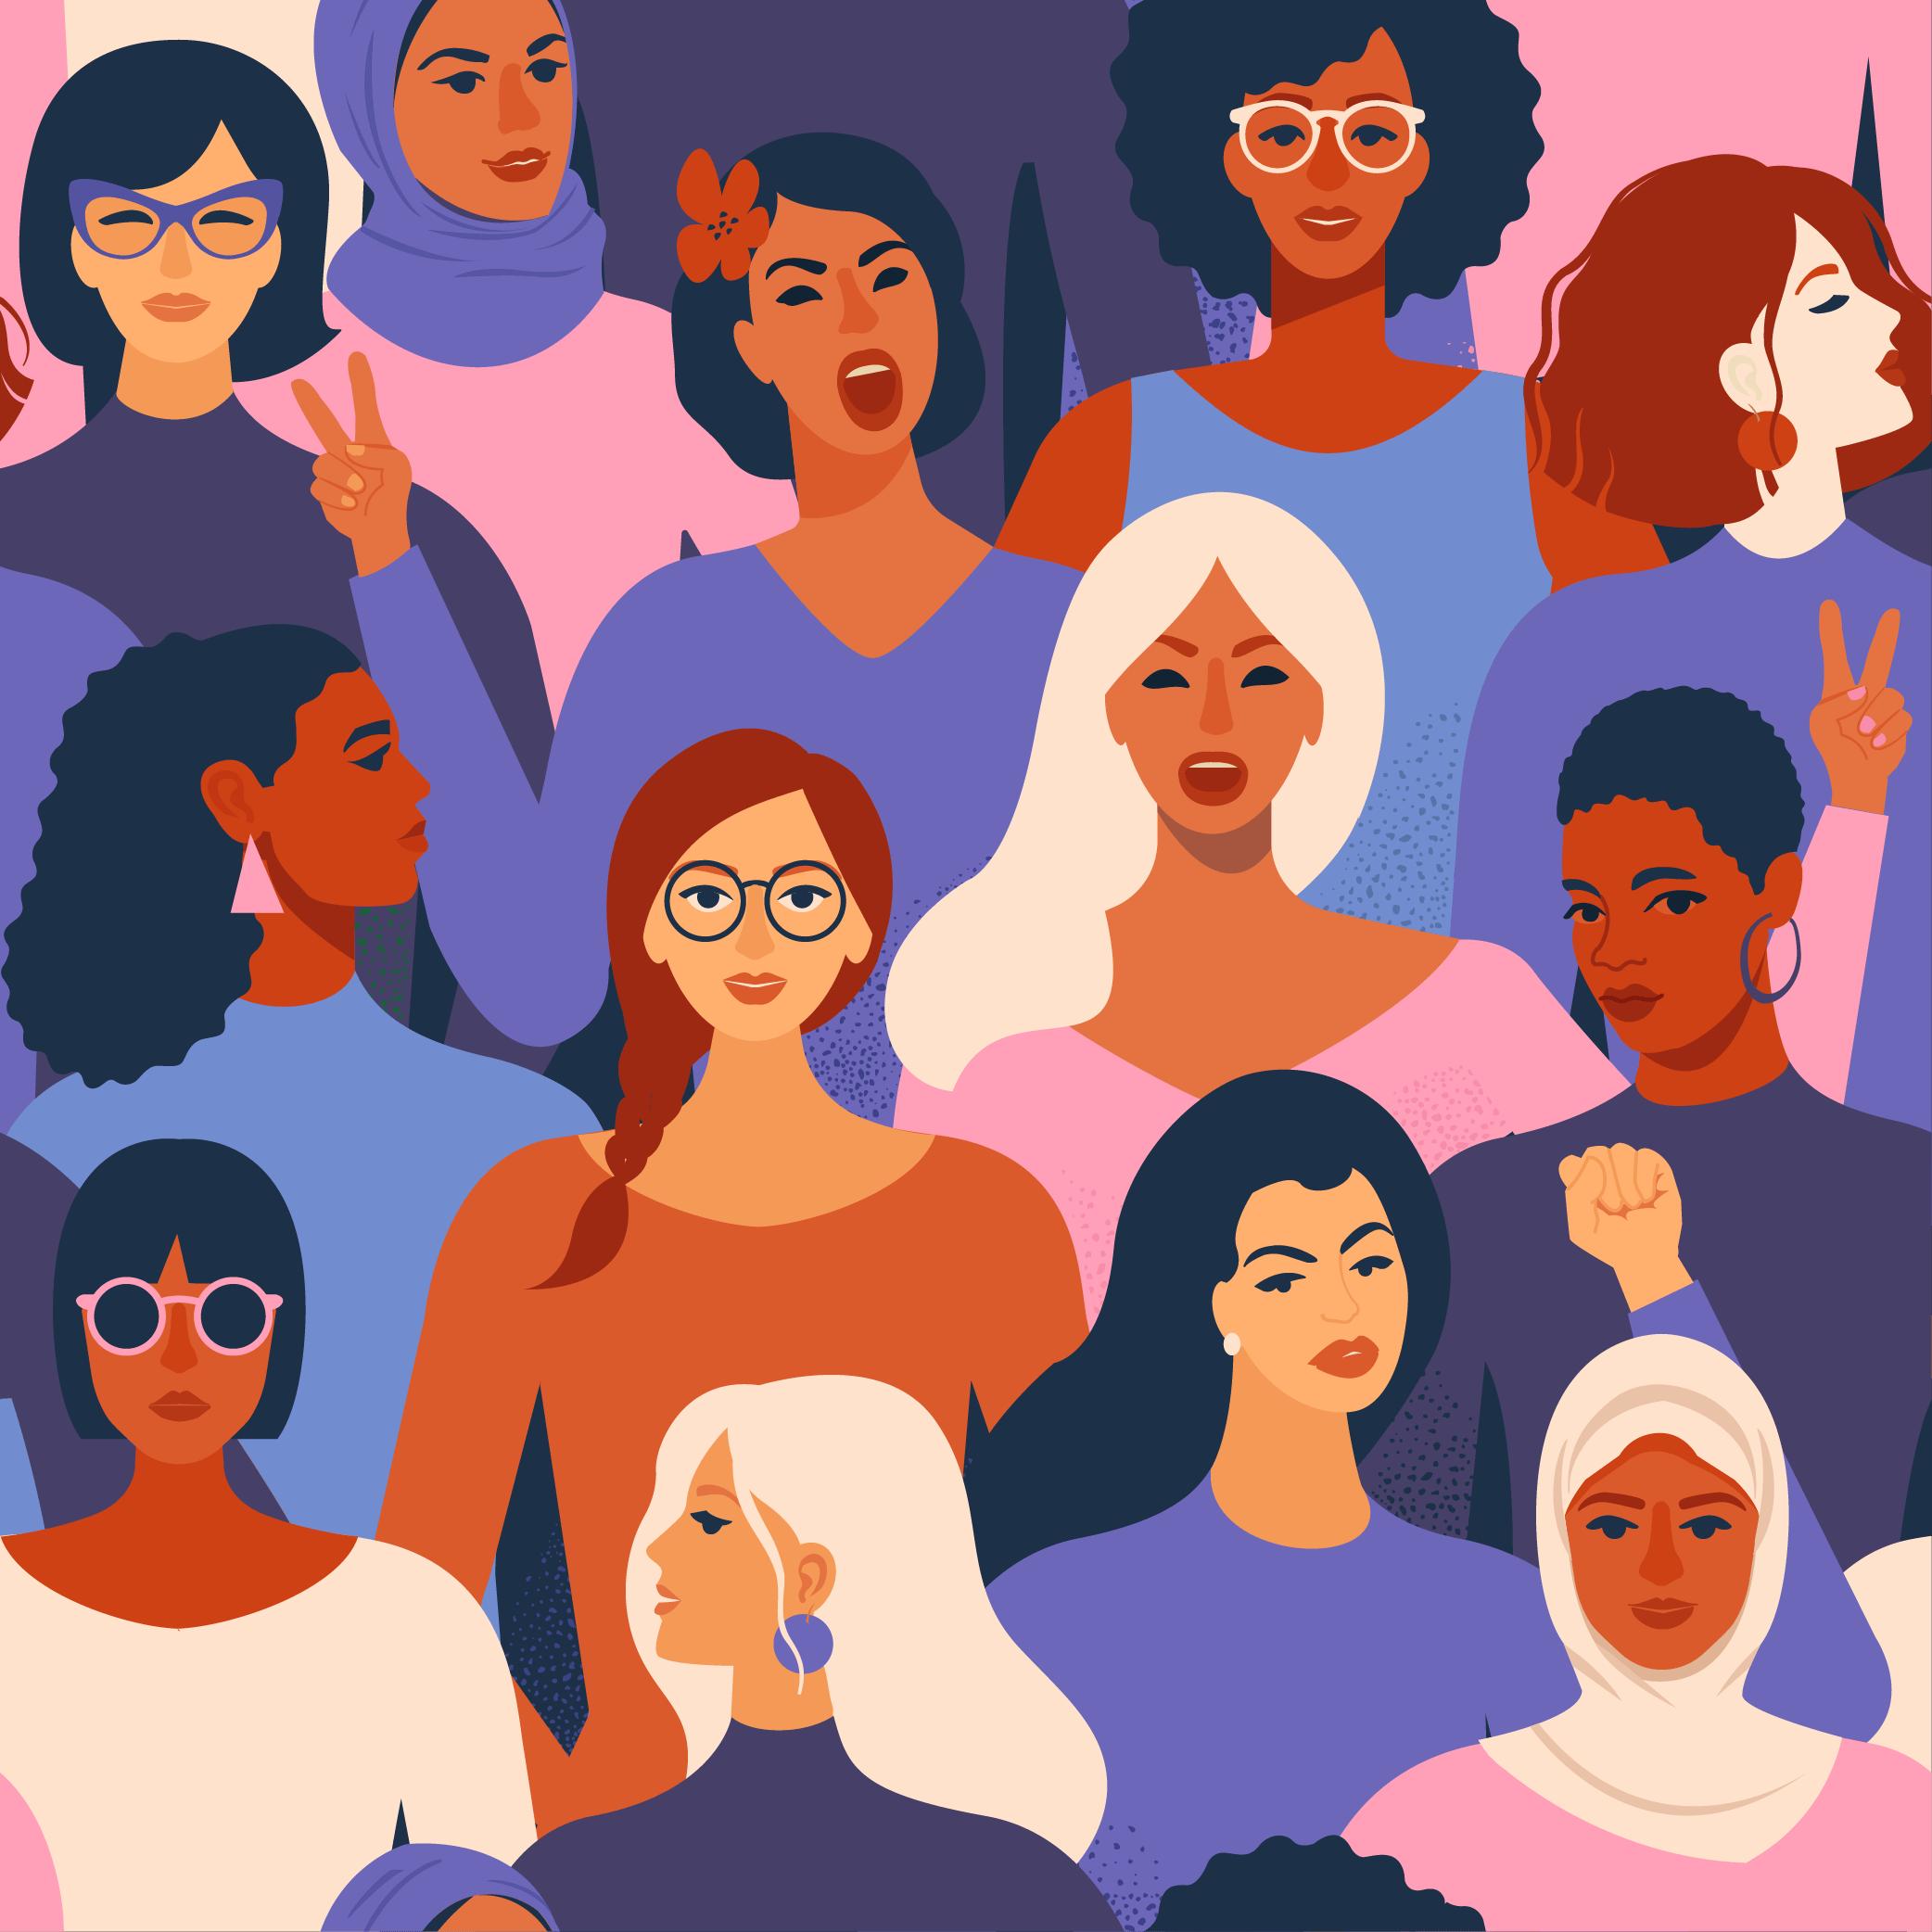 Illustration of diverse women